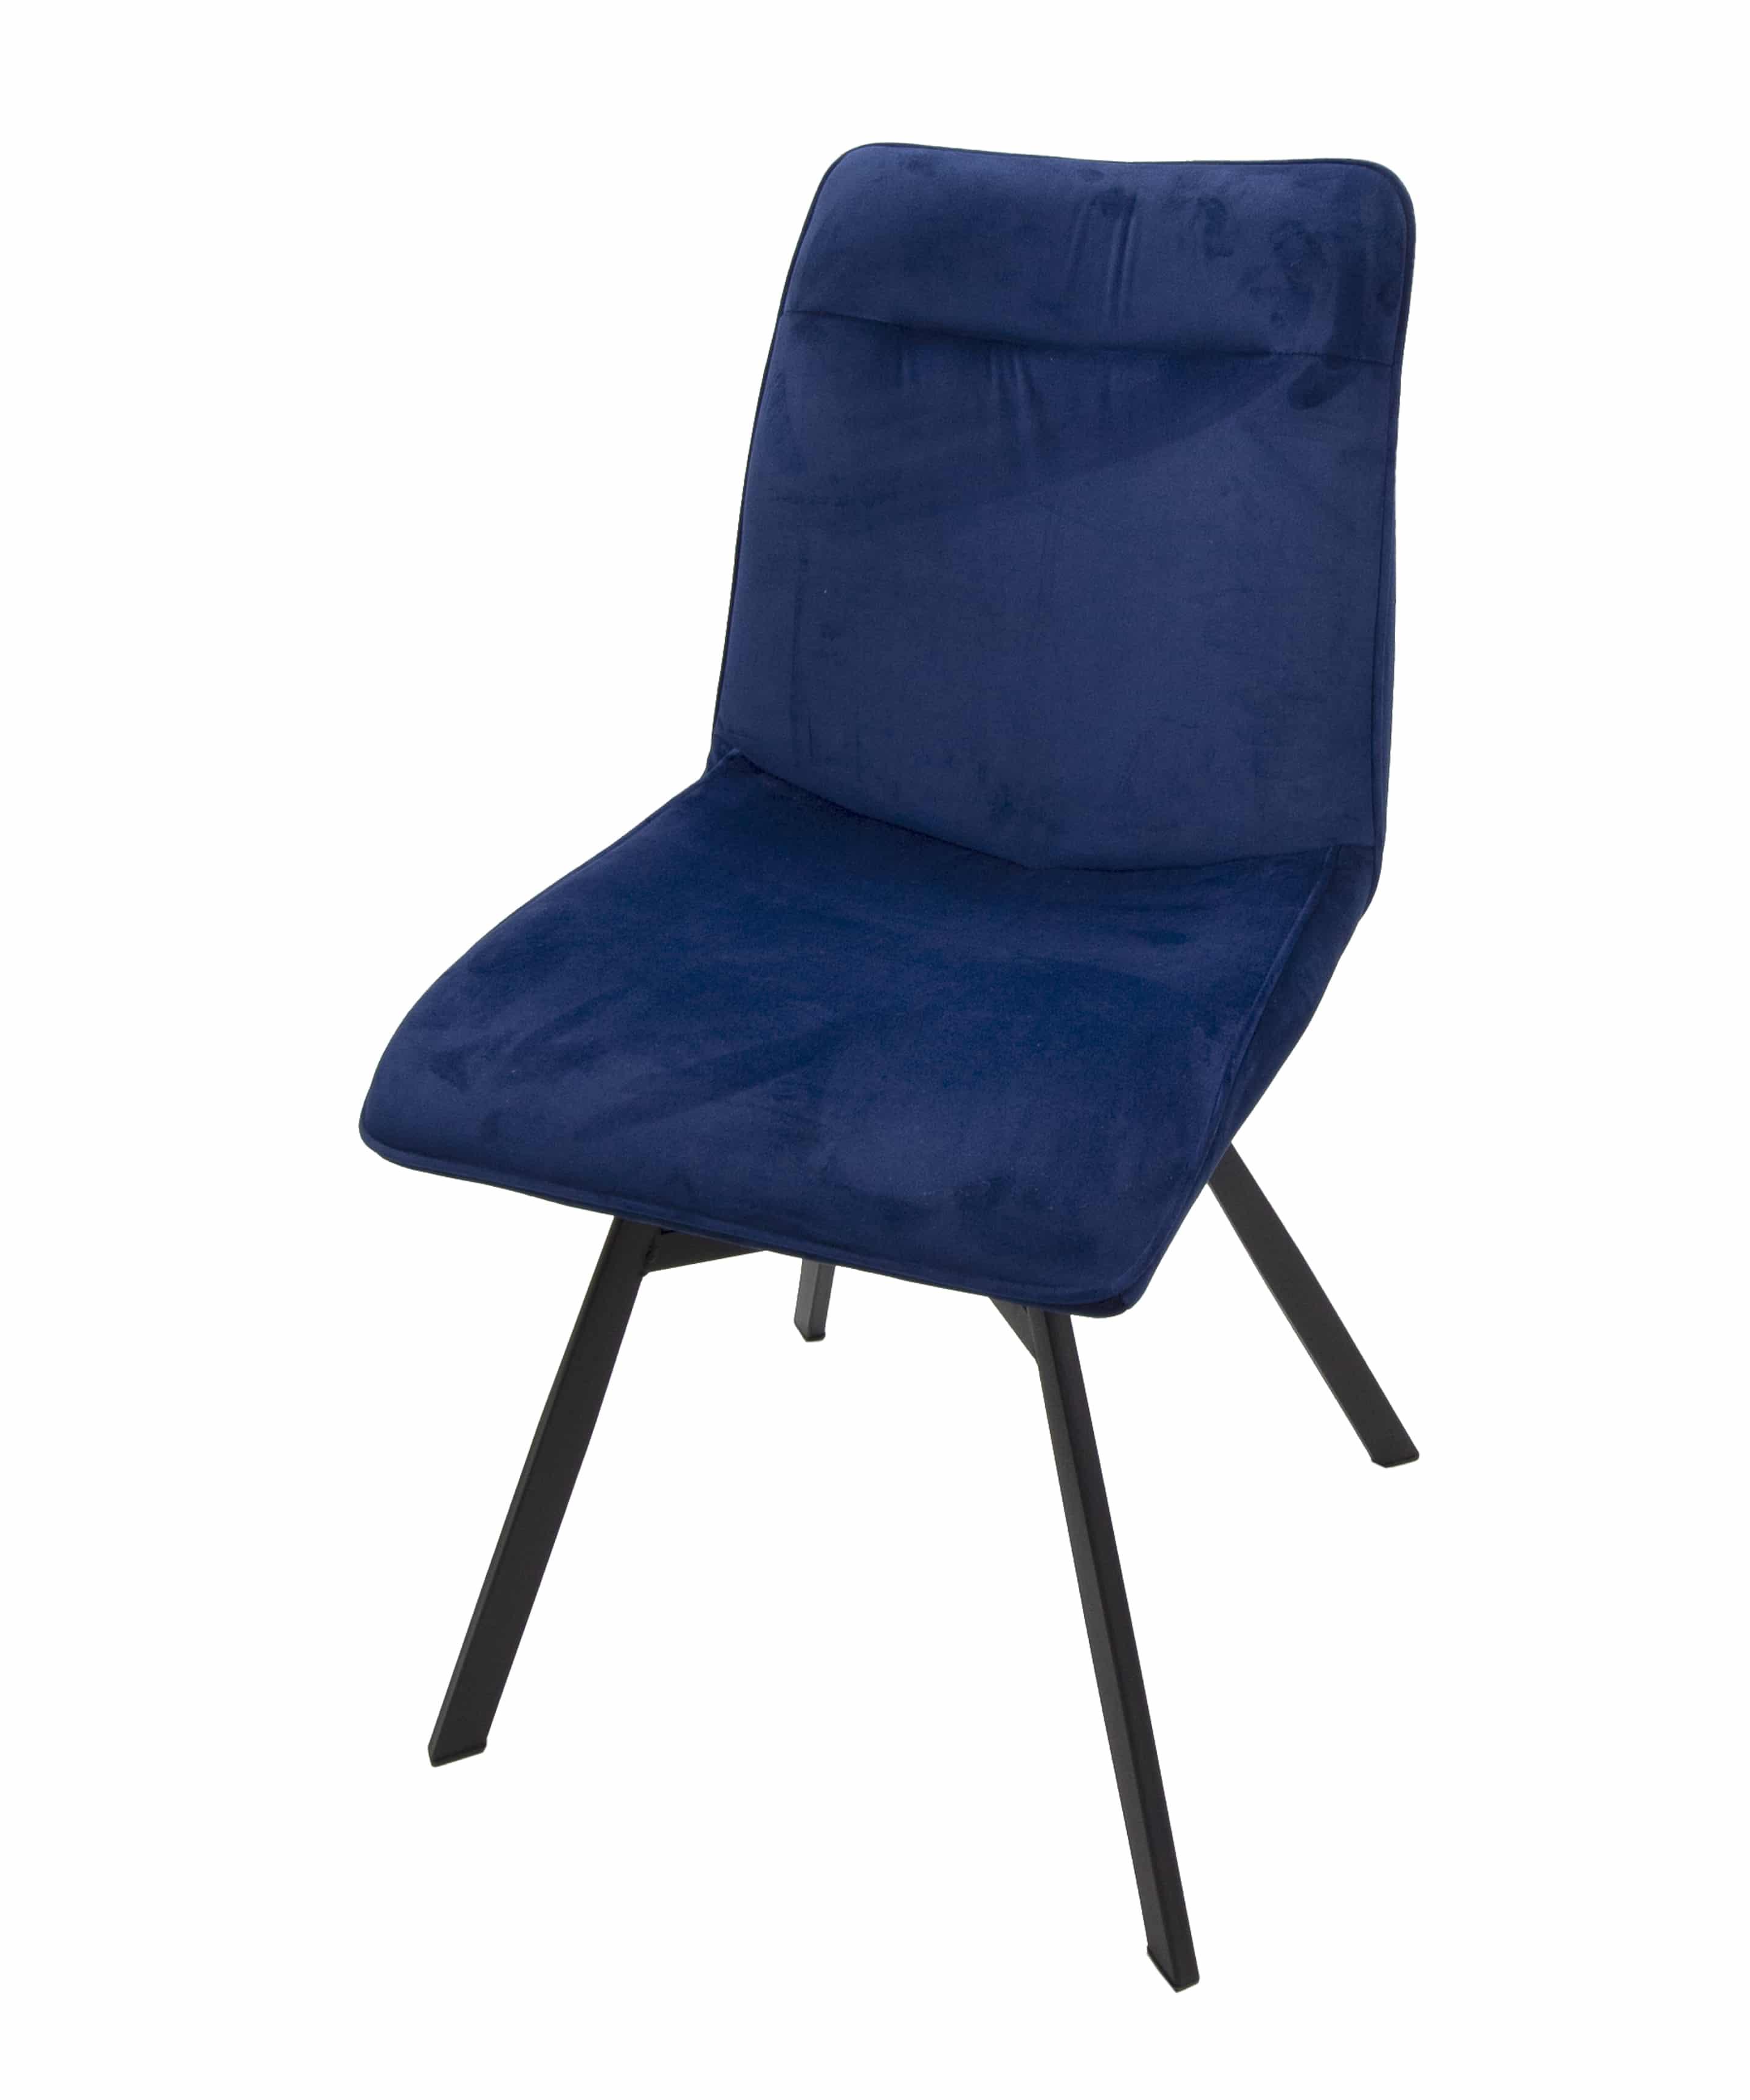 Harrison Lush Blue